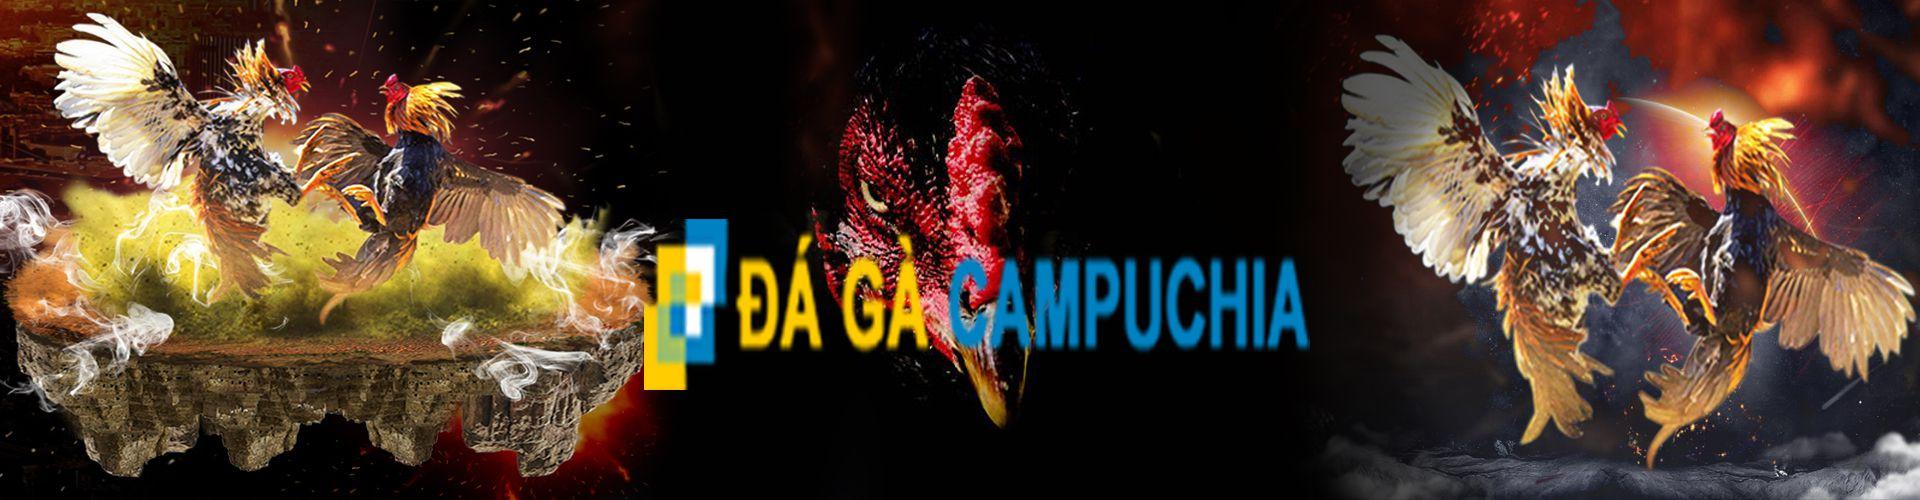 Dagacampuchia